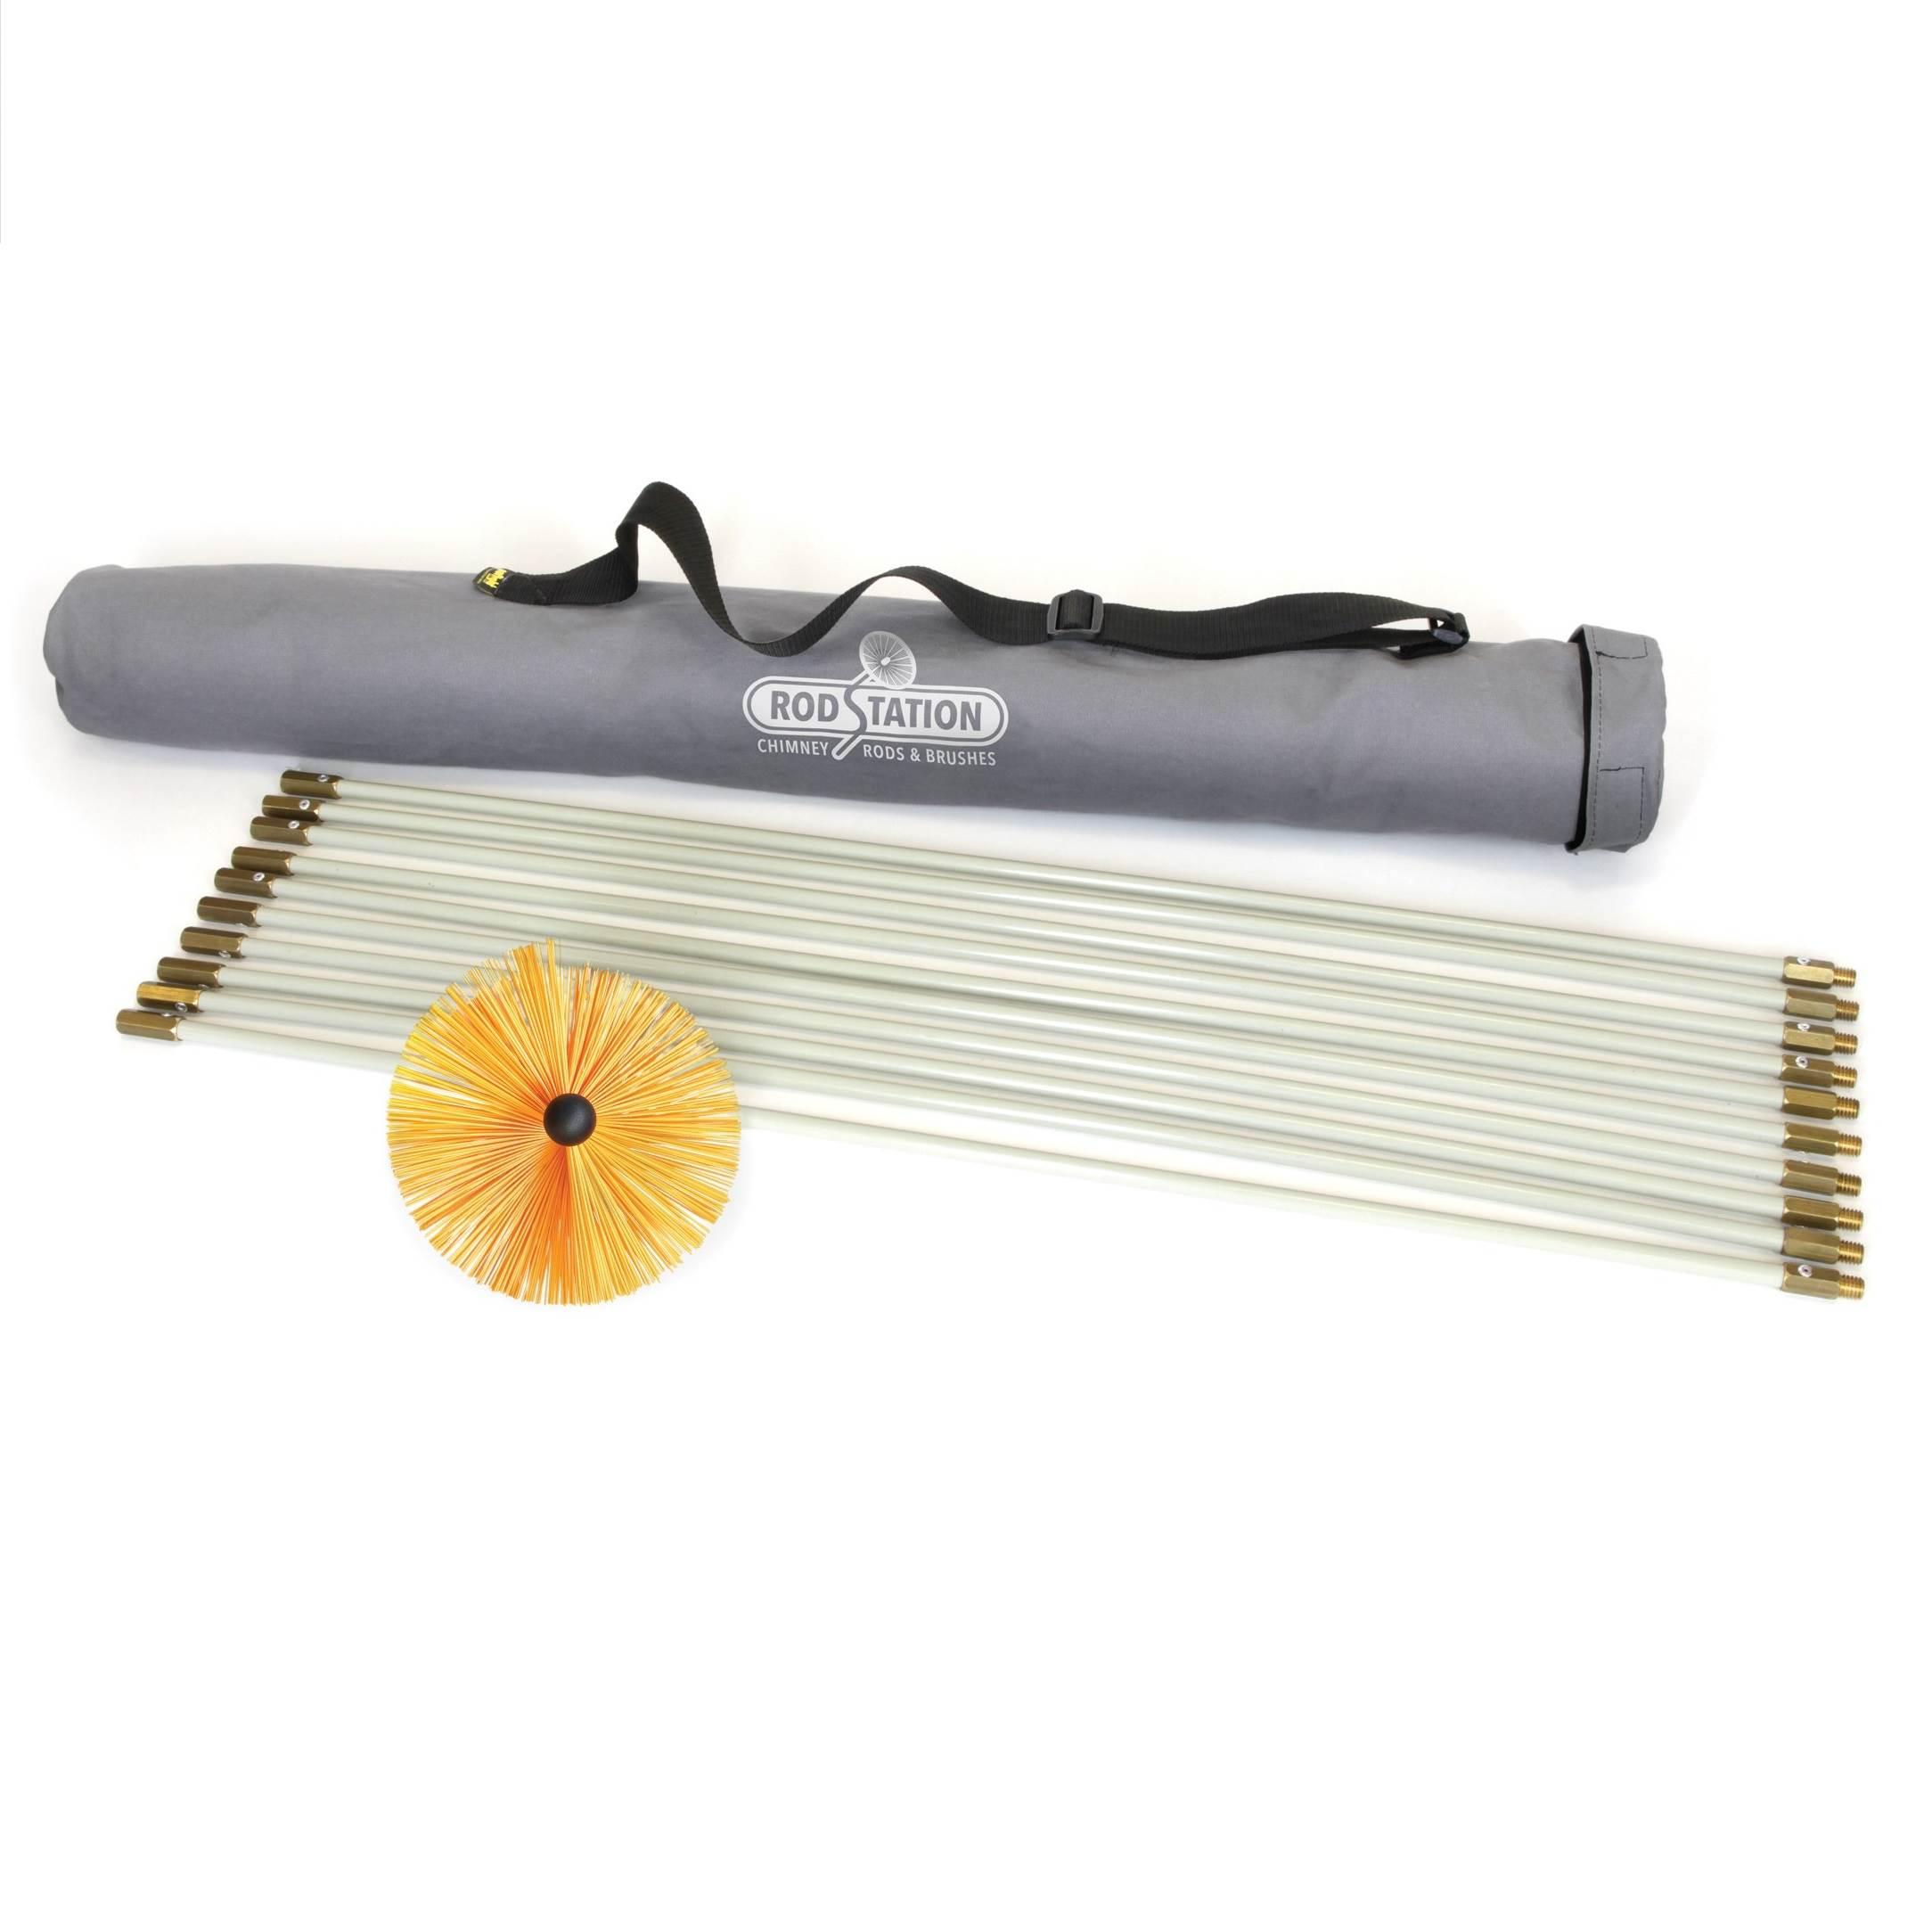 Chimney sweeping rod and brush kit